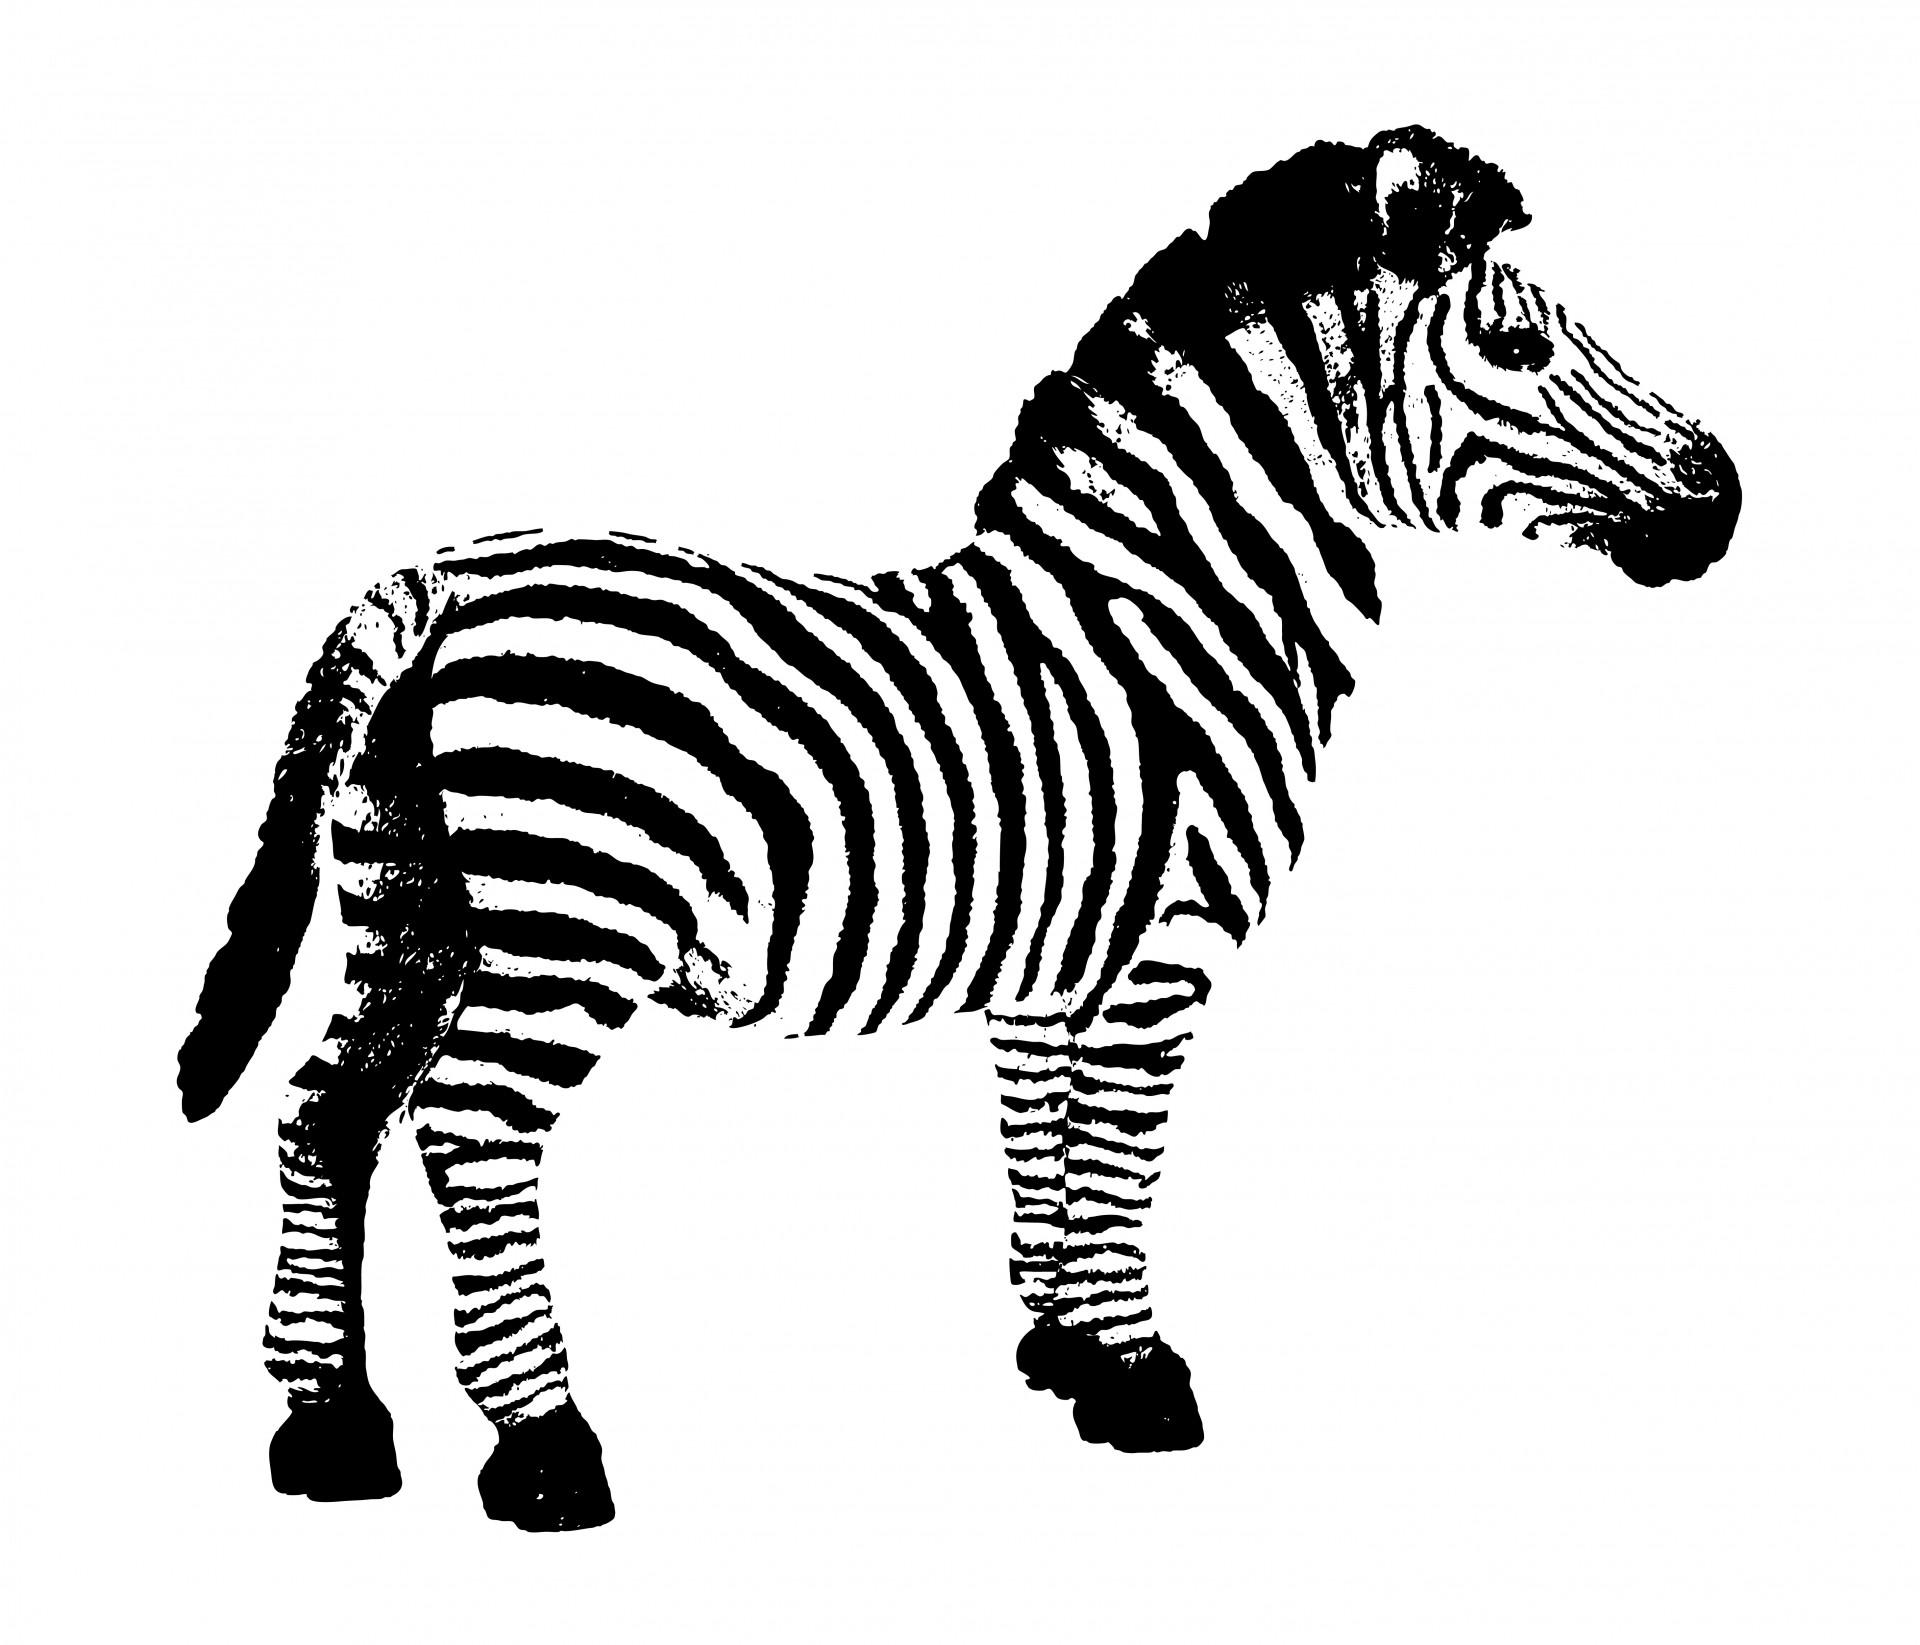 1920x1645 Cartoon zebra clipart free clip art images image 3